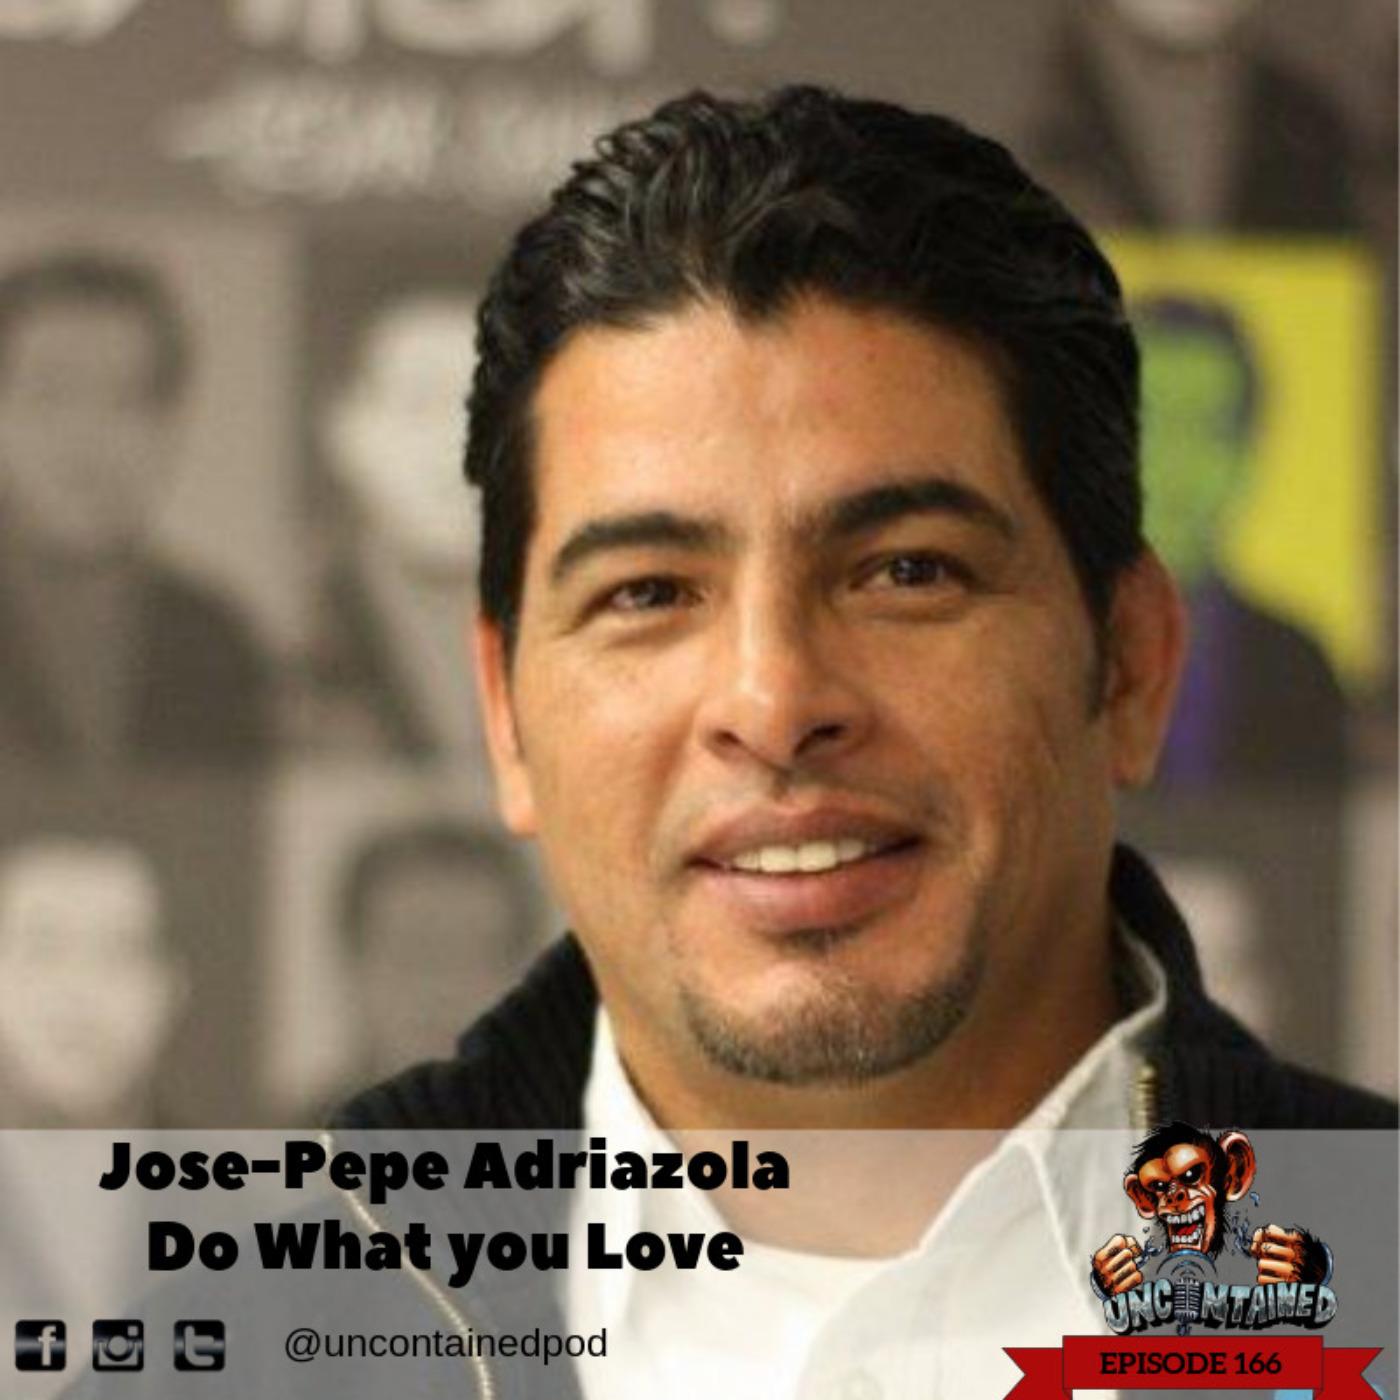 Episode 166: Jose-Pepe Adriazola - Do What You Love